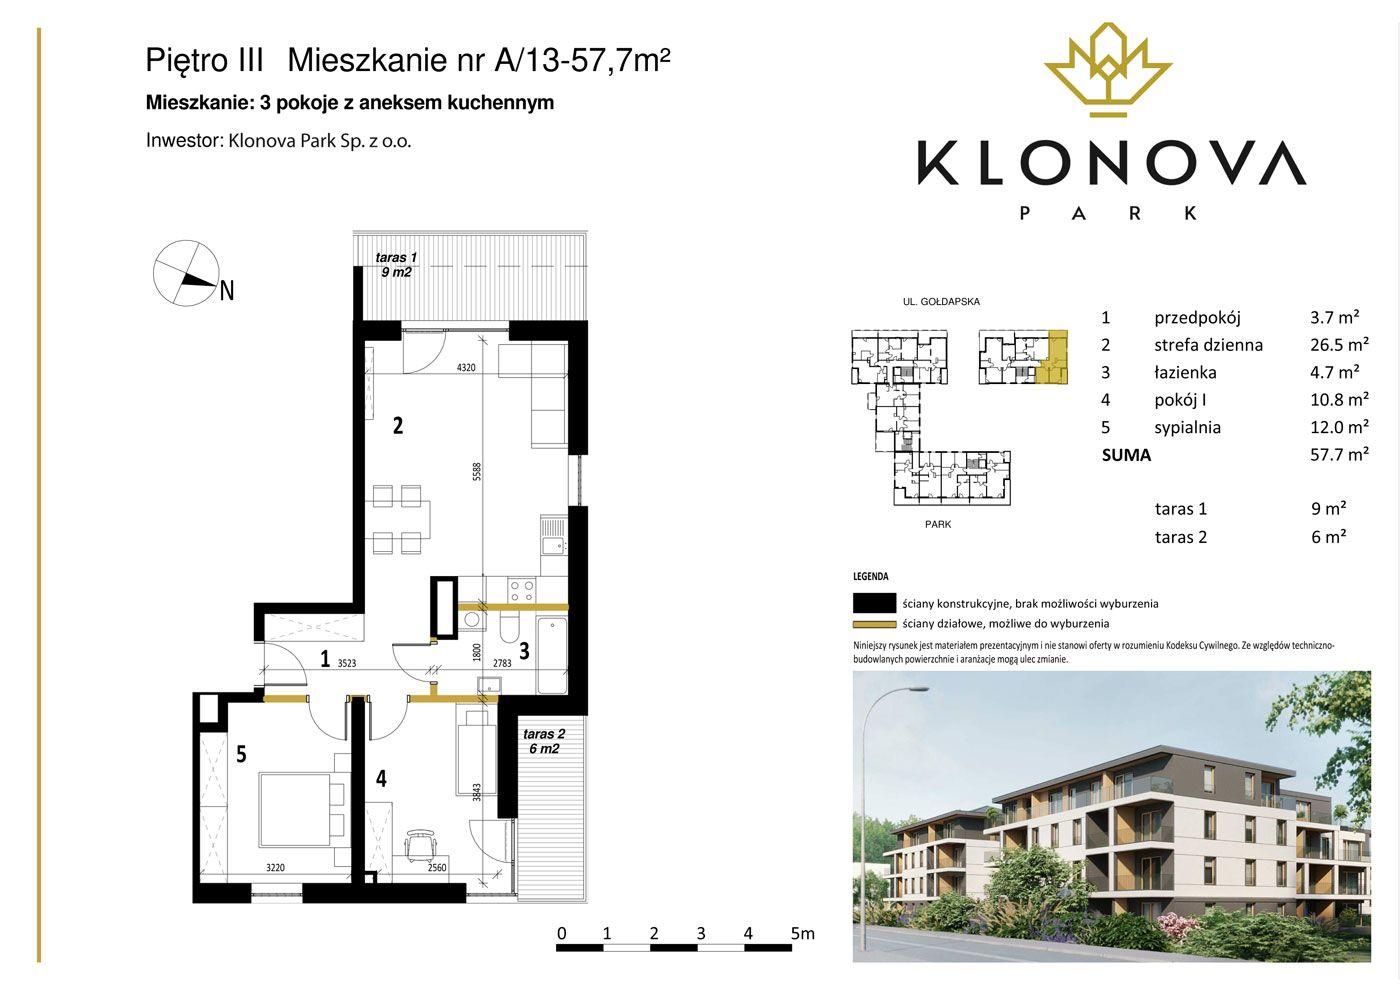 Apartamenty Klonova Park - Plan mieszkania A/13